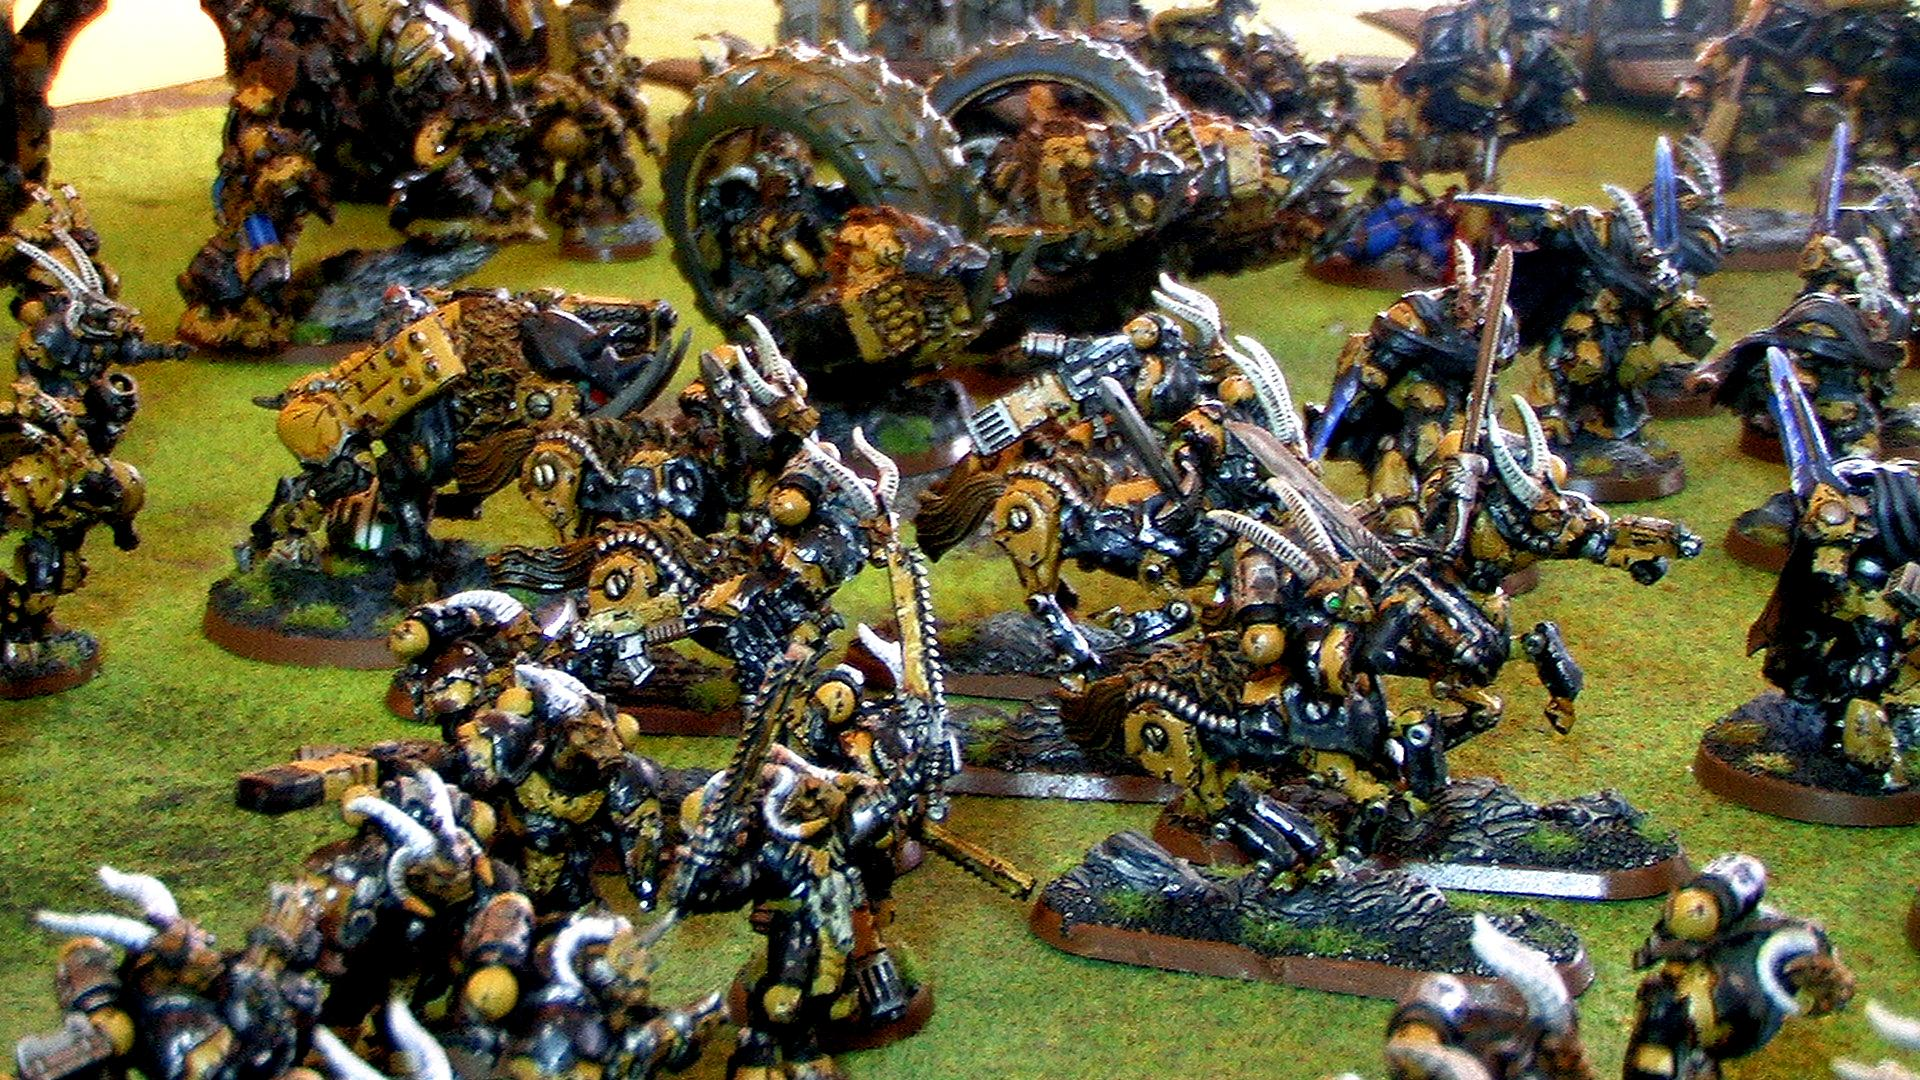 Army, Beastmen, Space, Space Marines, Warhammer 40,000, Wolves